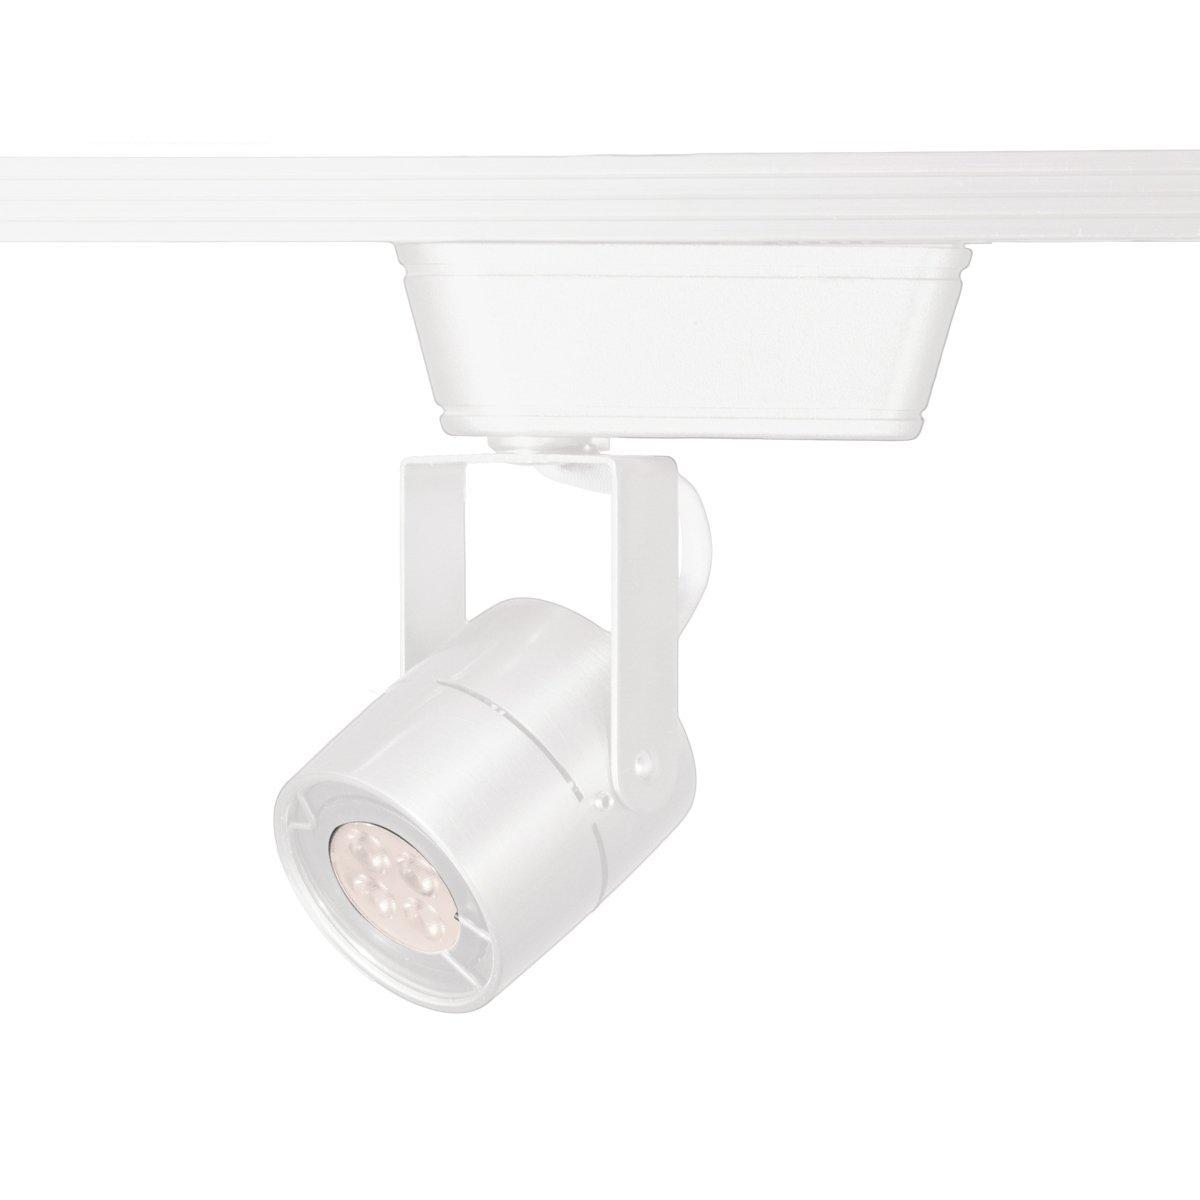 WAC Lighting HHT-809LED-WT Low Voltage 120V Luminaire H Track